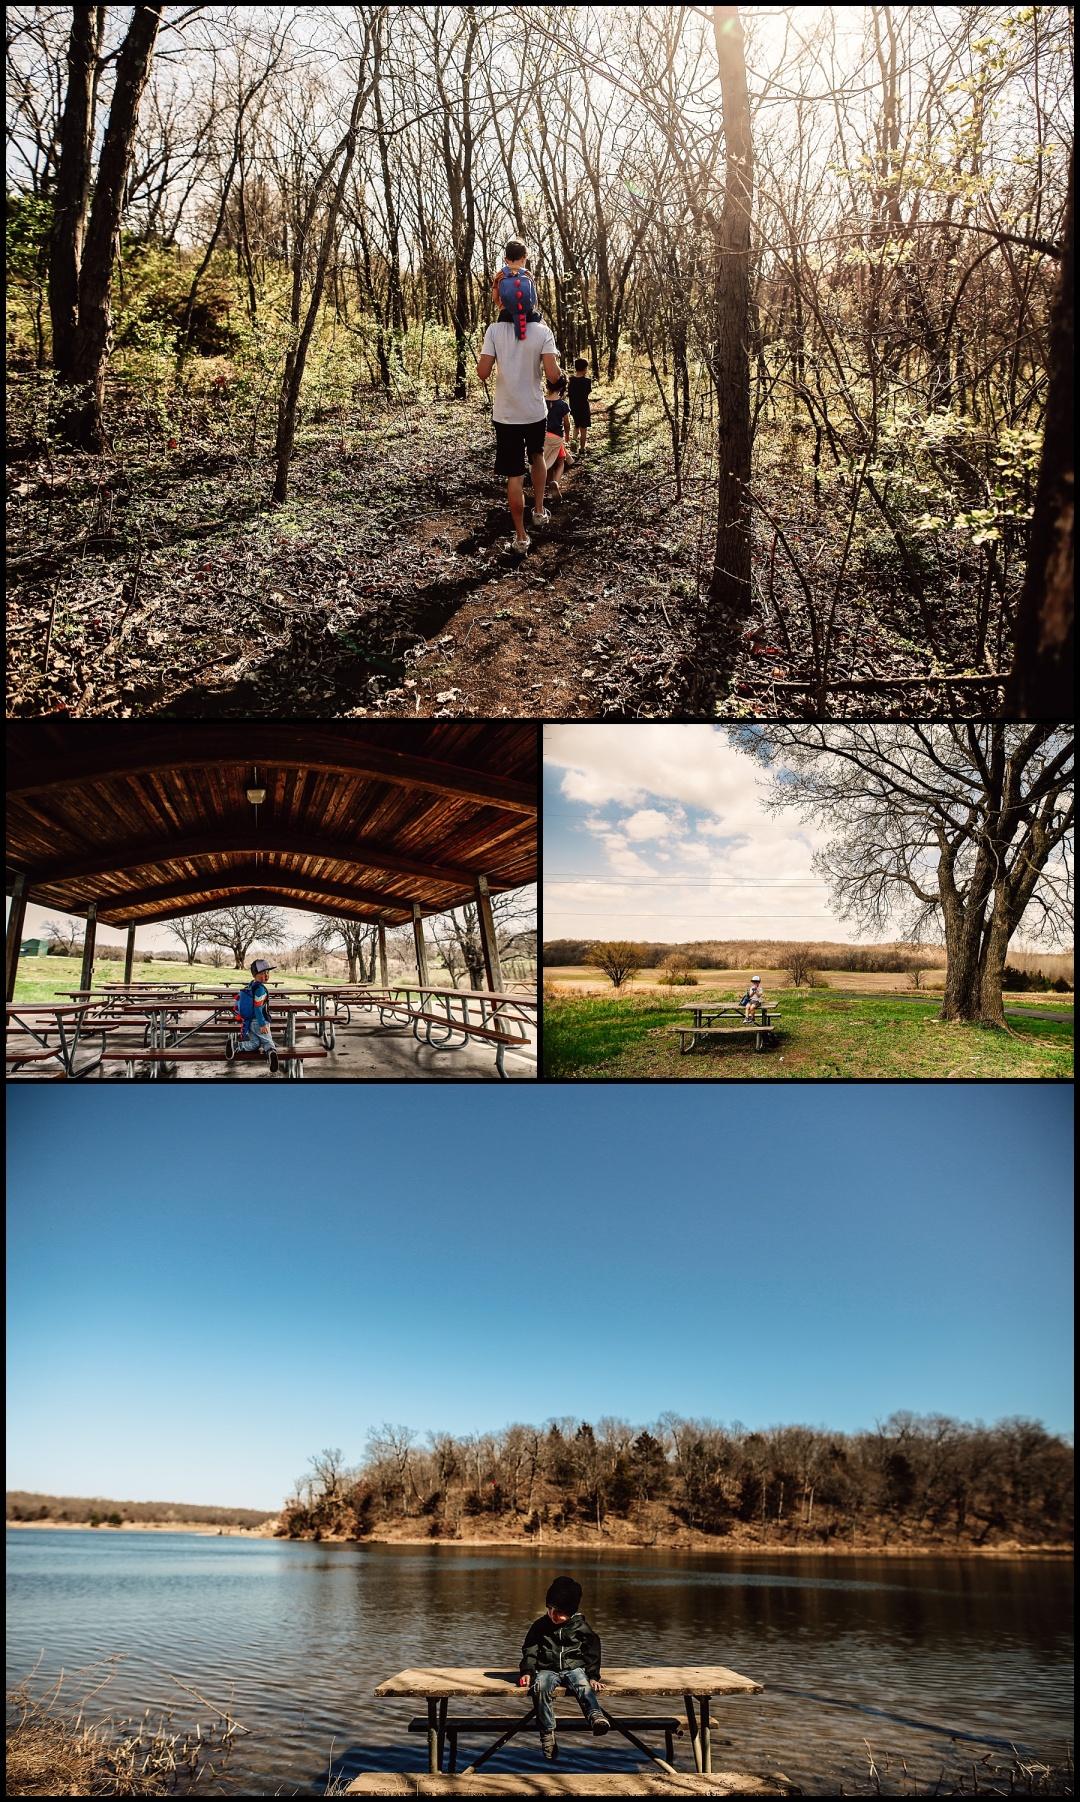 Kansas City Family Child Adventure Summer Photography Hiking Park